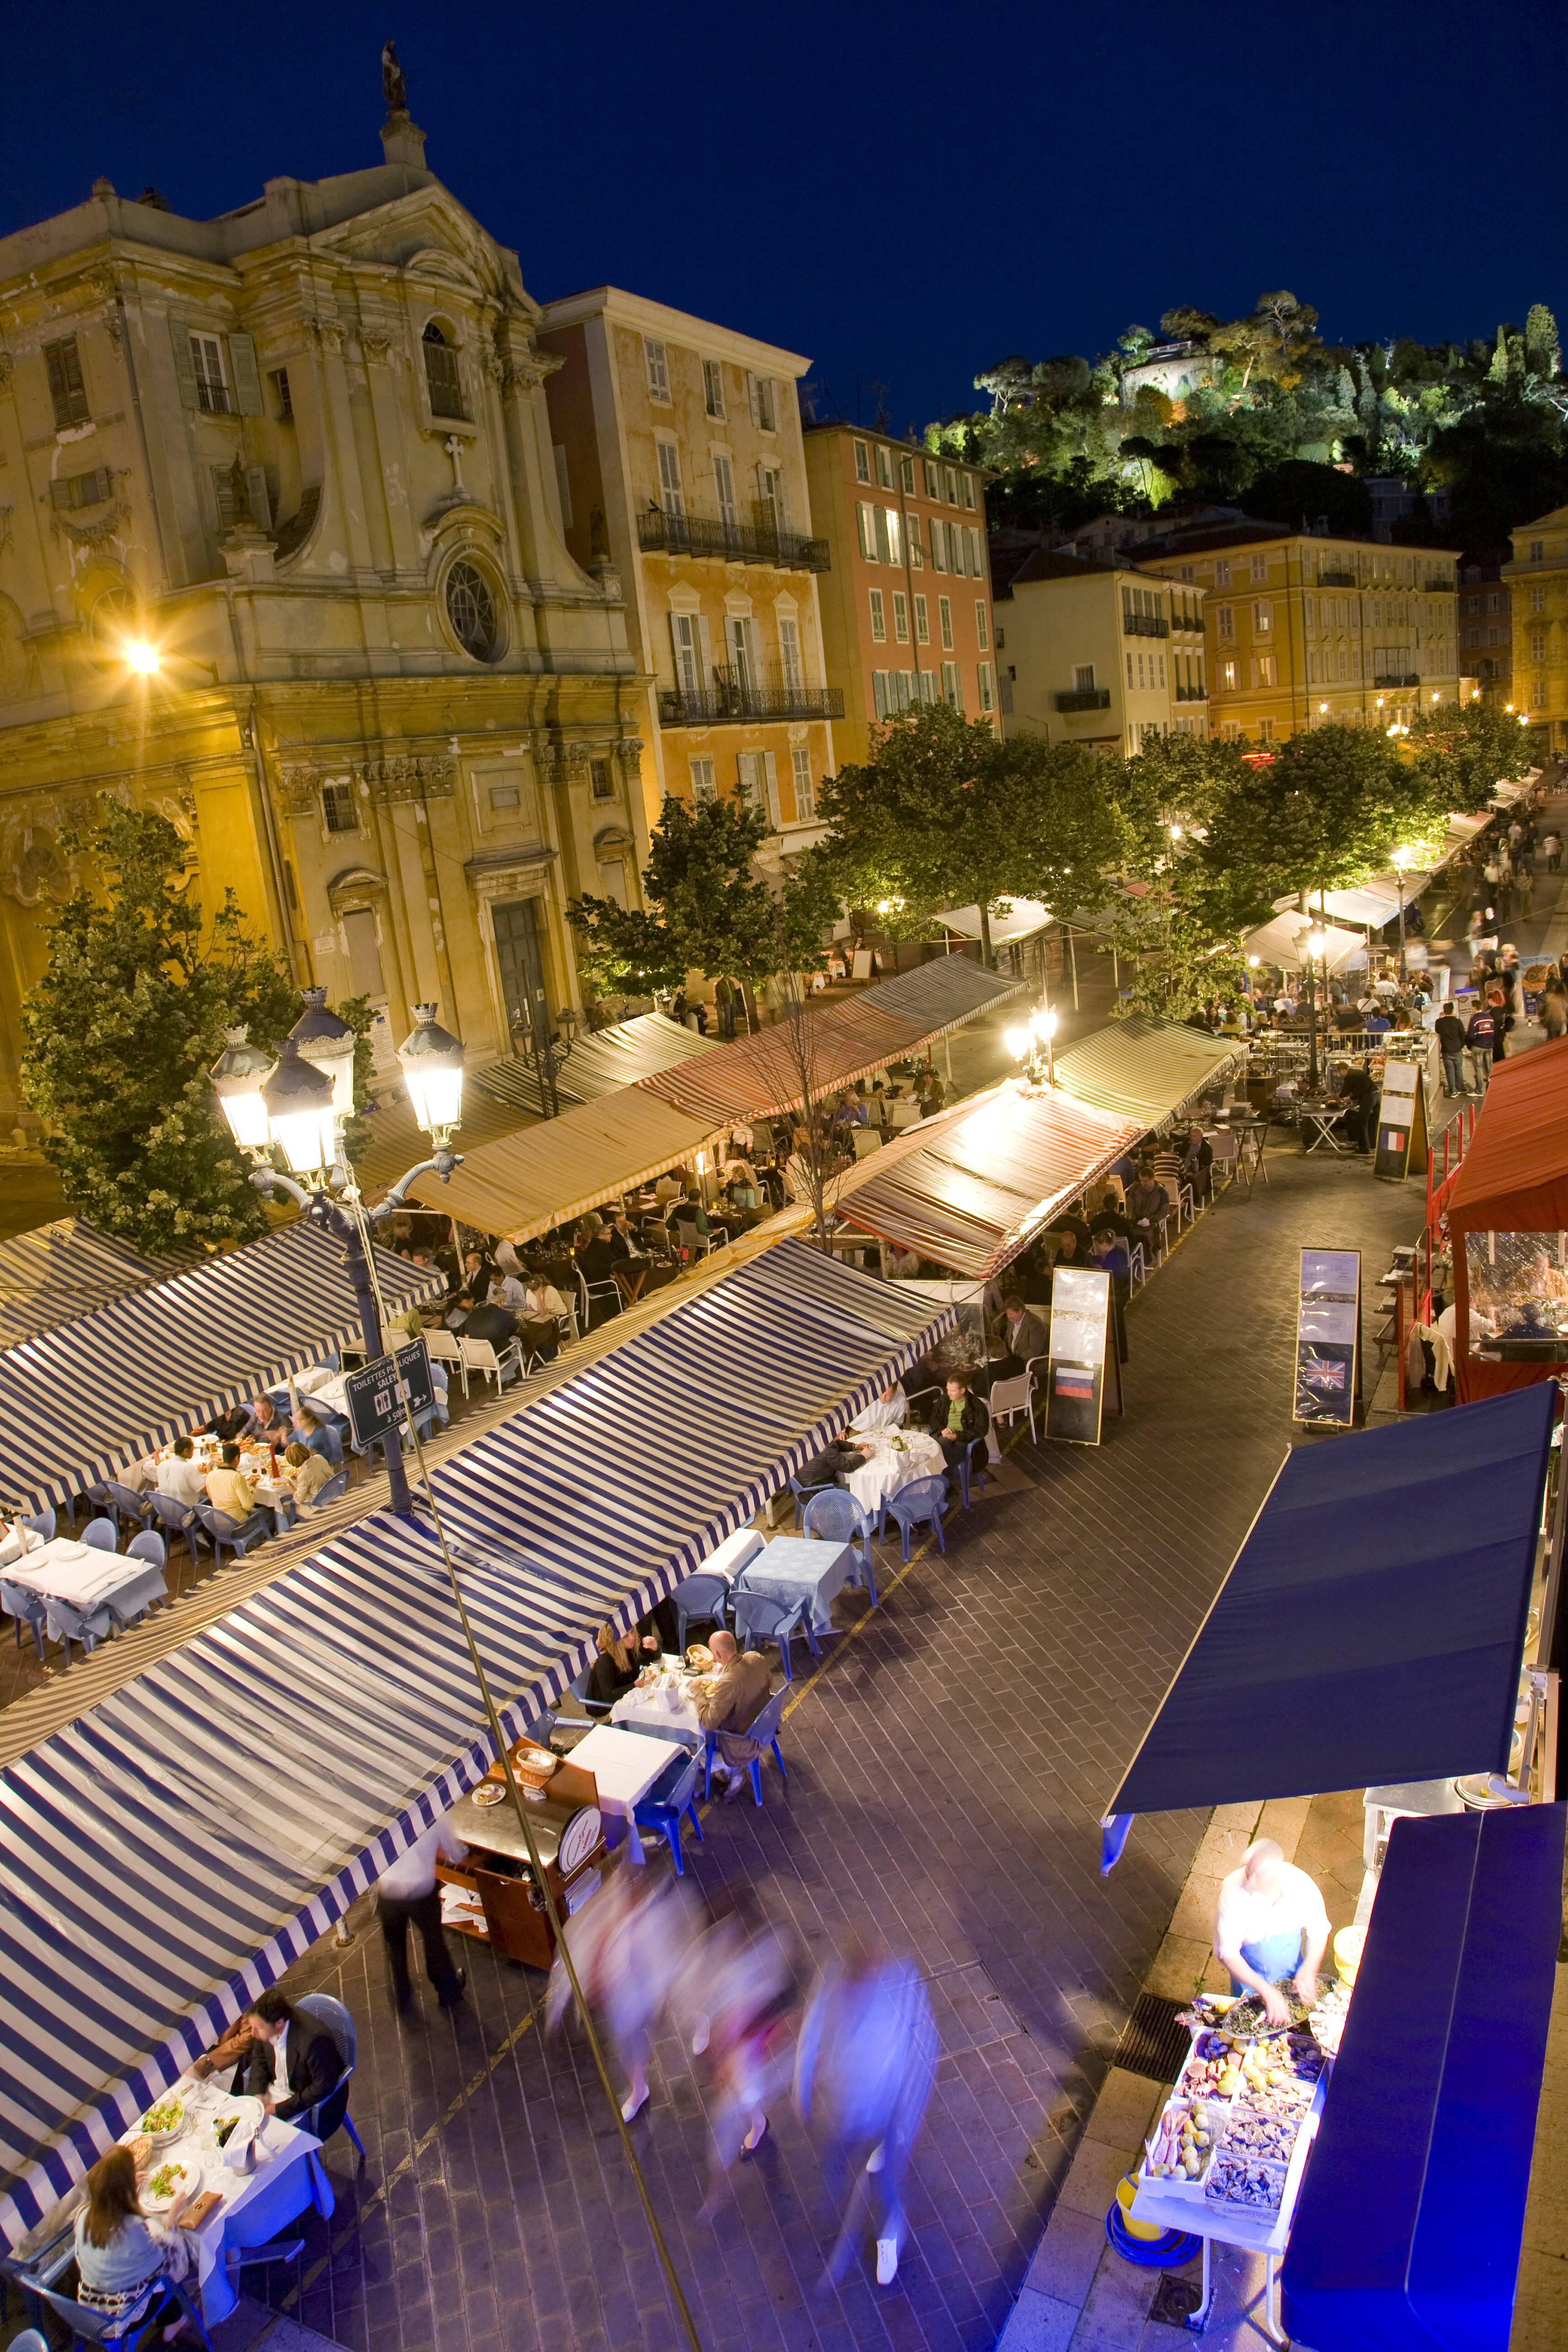 France, Cote d Azur, Nice, Cours Saleya at night PUBLICATIONxINxGERxSUIxAUTxHUNxONLY WD00135France Cote D Azur Nice Cours Saleya AT Night PUBLICATIONxINxGERxSUIxAUTxHUNxONLY WD00135